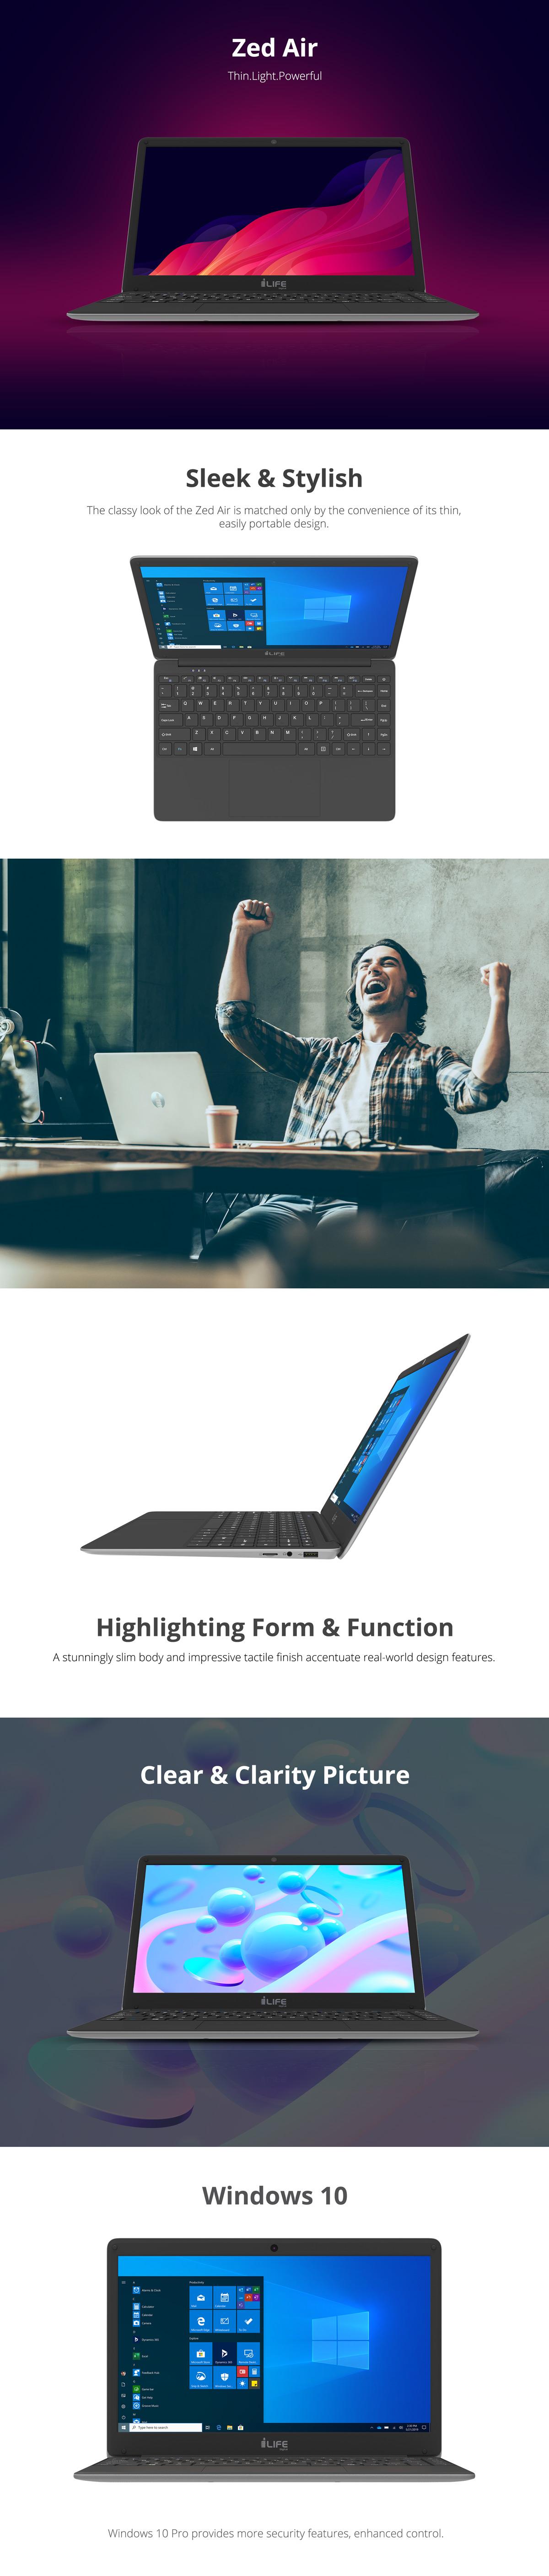 Zedair Slimmest Laptop In Its Category 14 Inch Notebook Ilife Digital